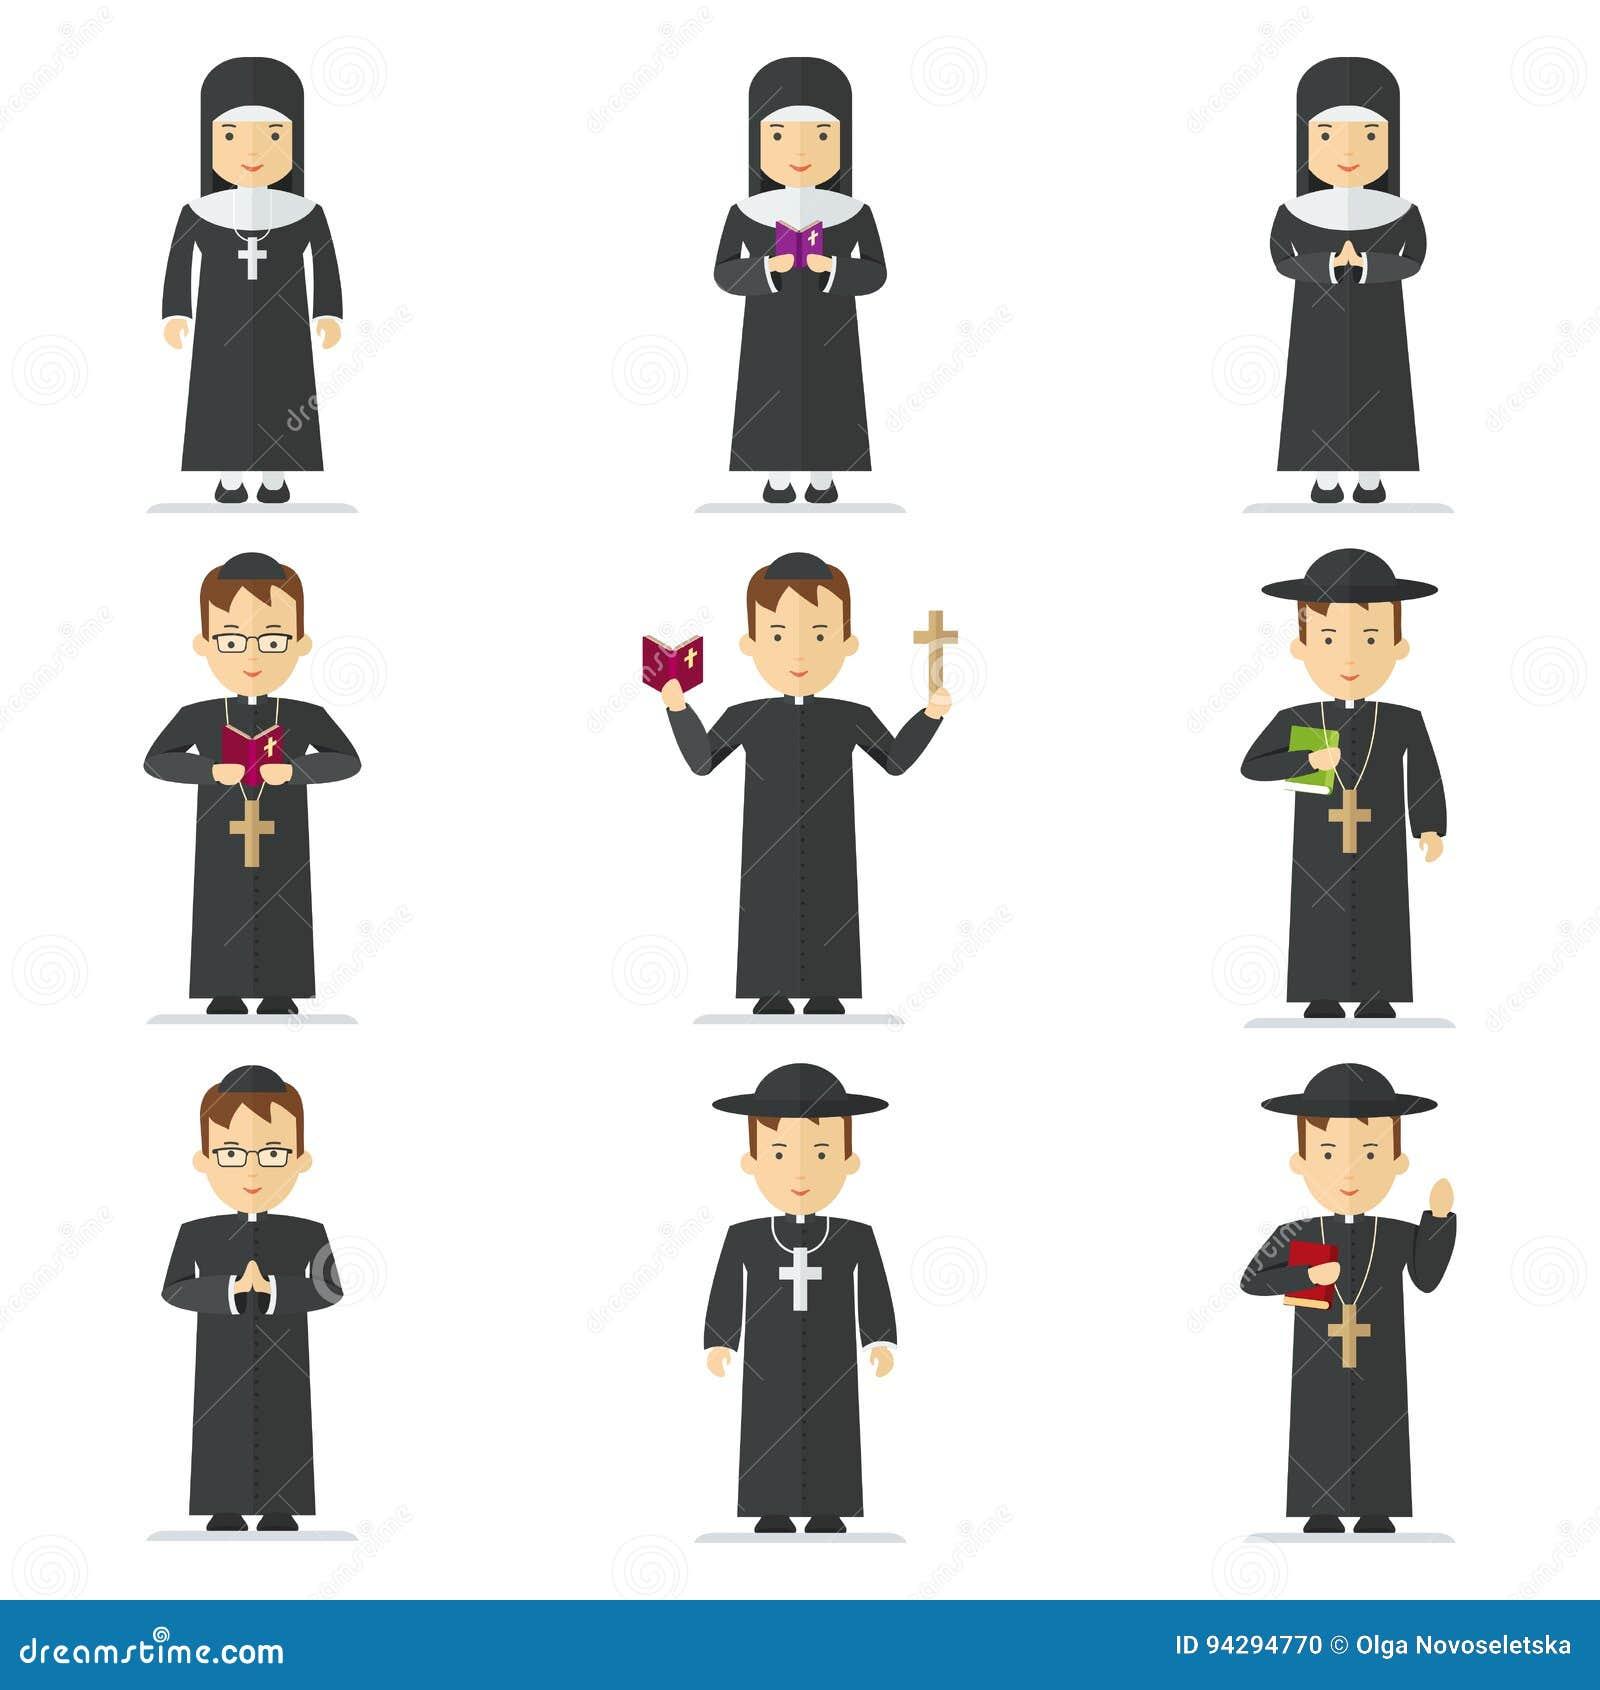 sermon illustrations about dating Illustration on thanksgiving sermon find stories and bible illustrations to use in your sermons and killer victims is ronan farrow dating joy reid greta van.